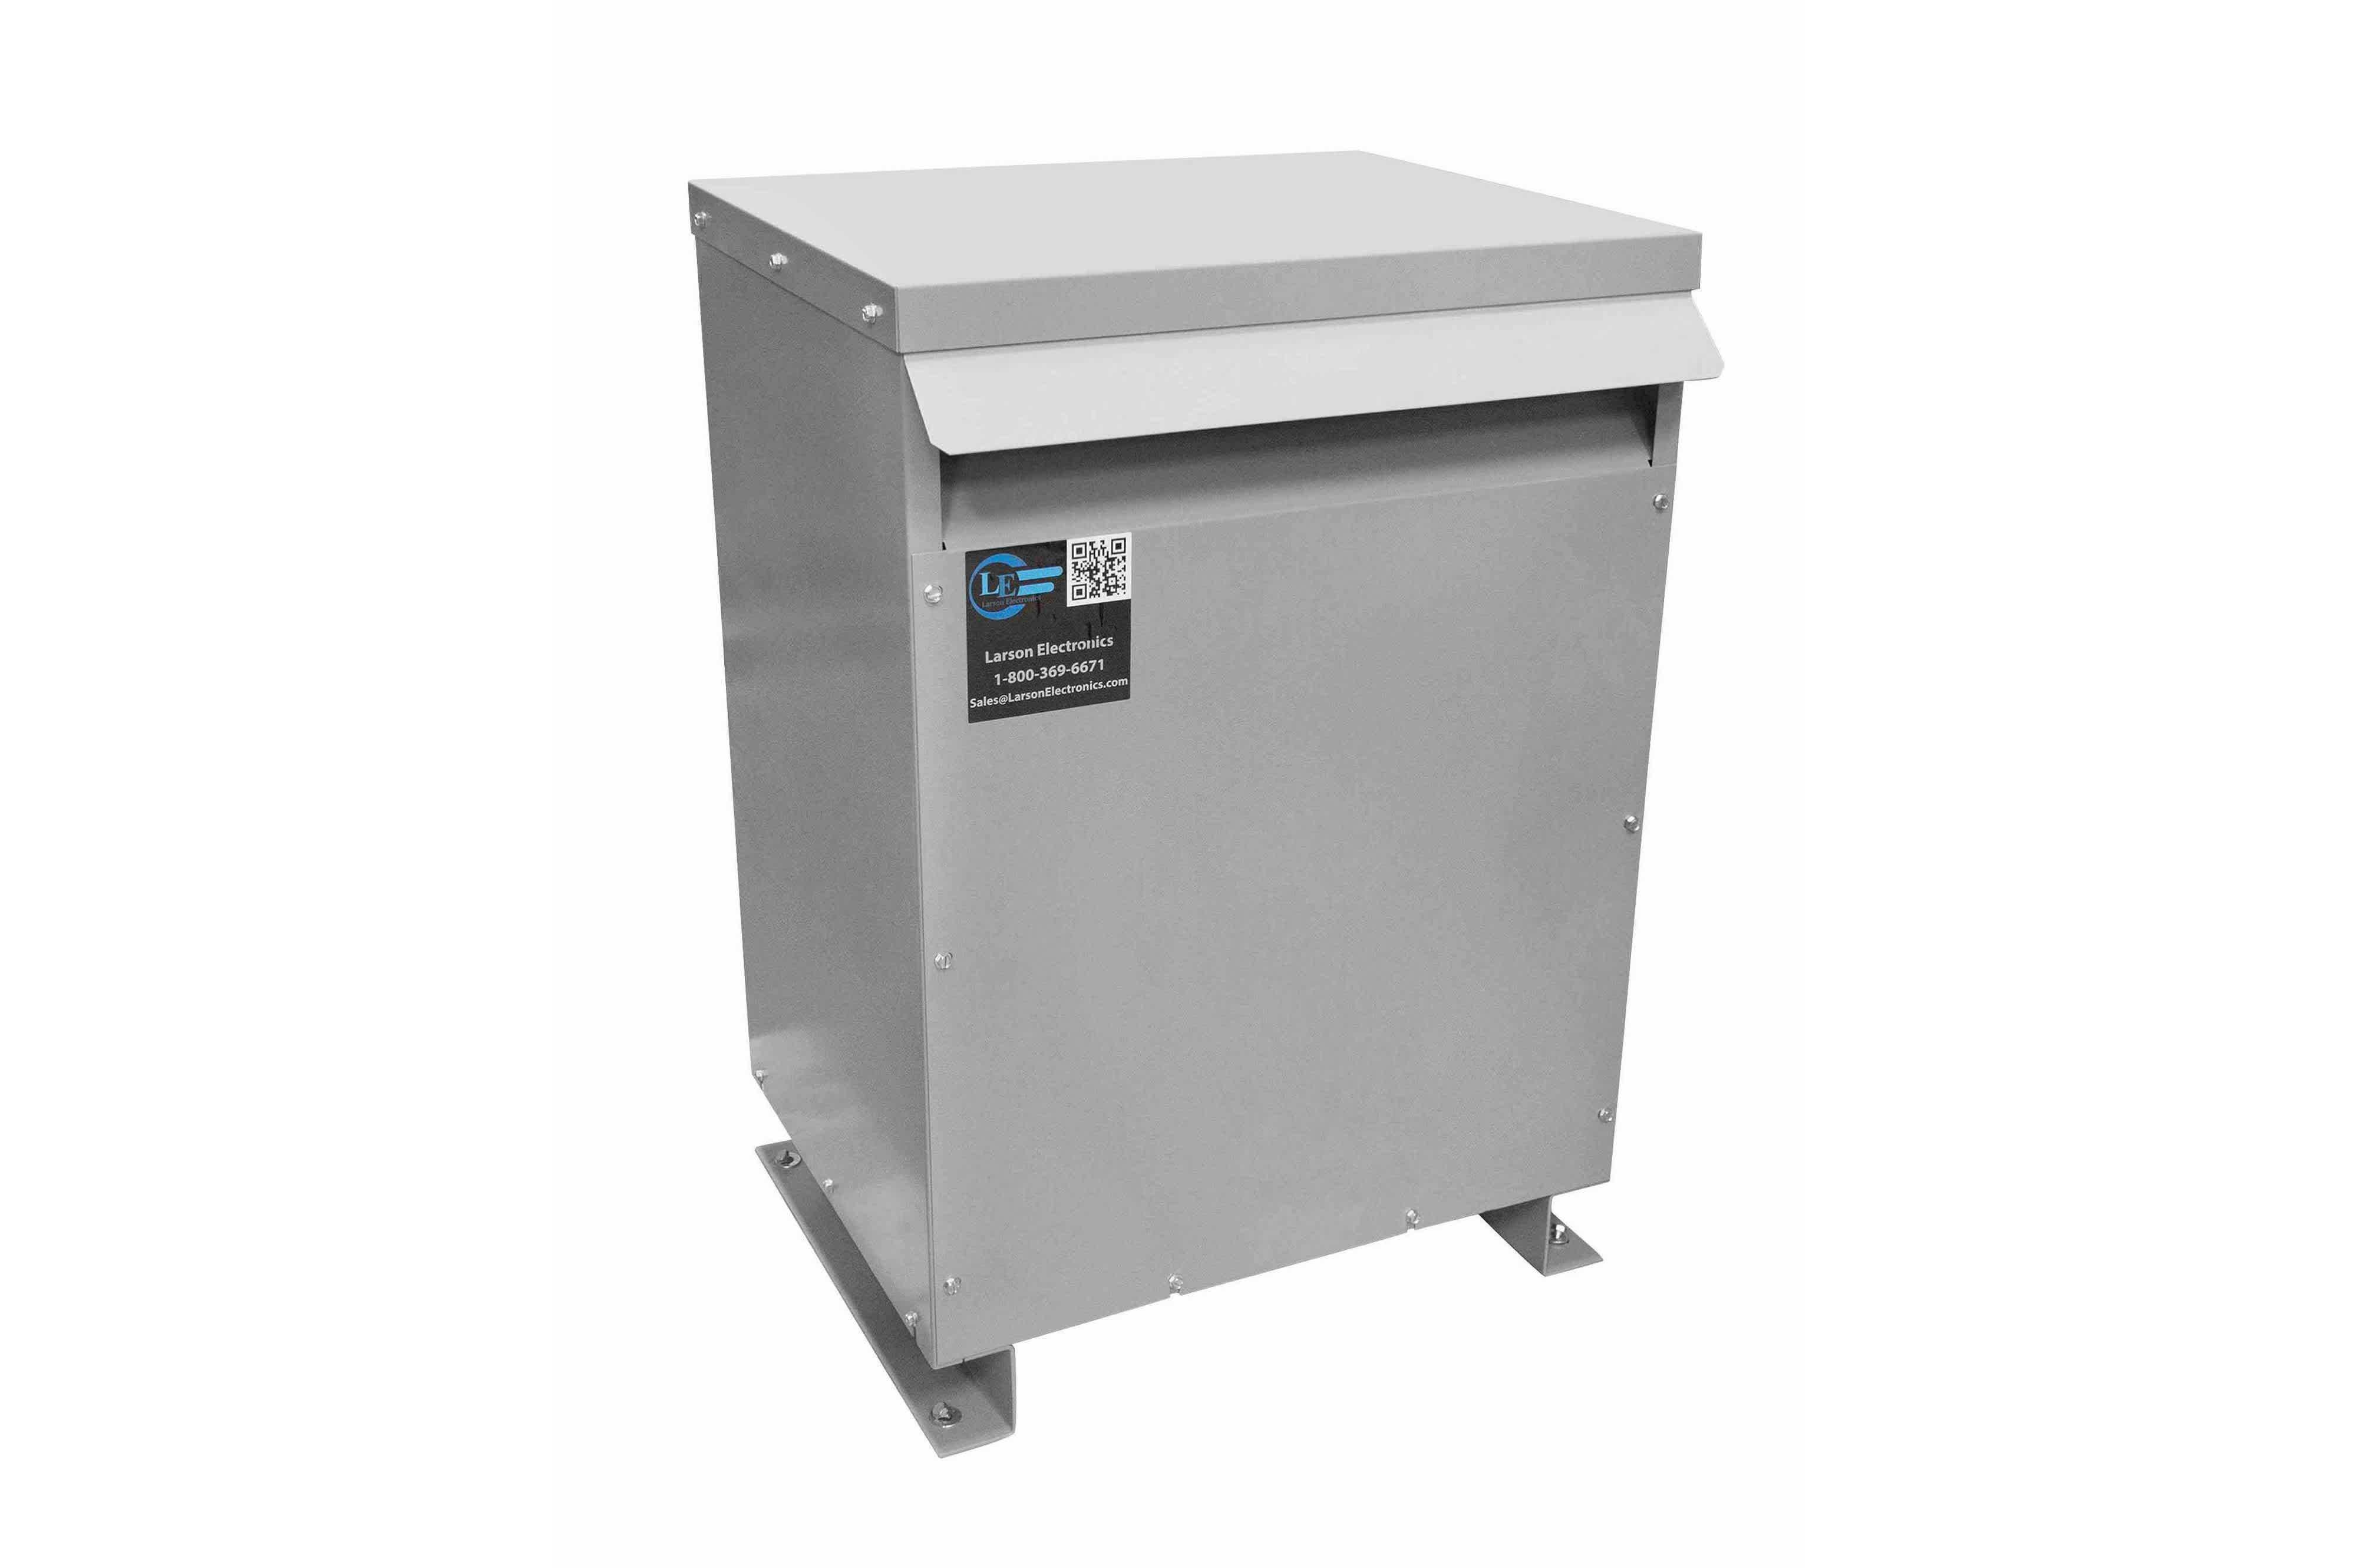 9 kVA 3PH Isolation Transformer, 208V Wye Primary, 208V Delta Secondary, N3R, Ventilated, 60 Hz